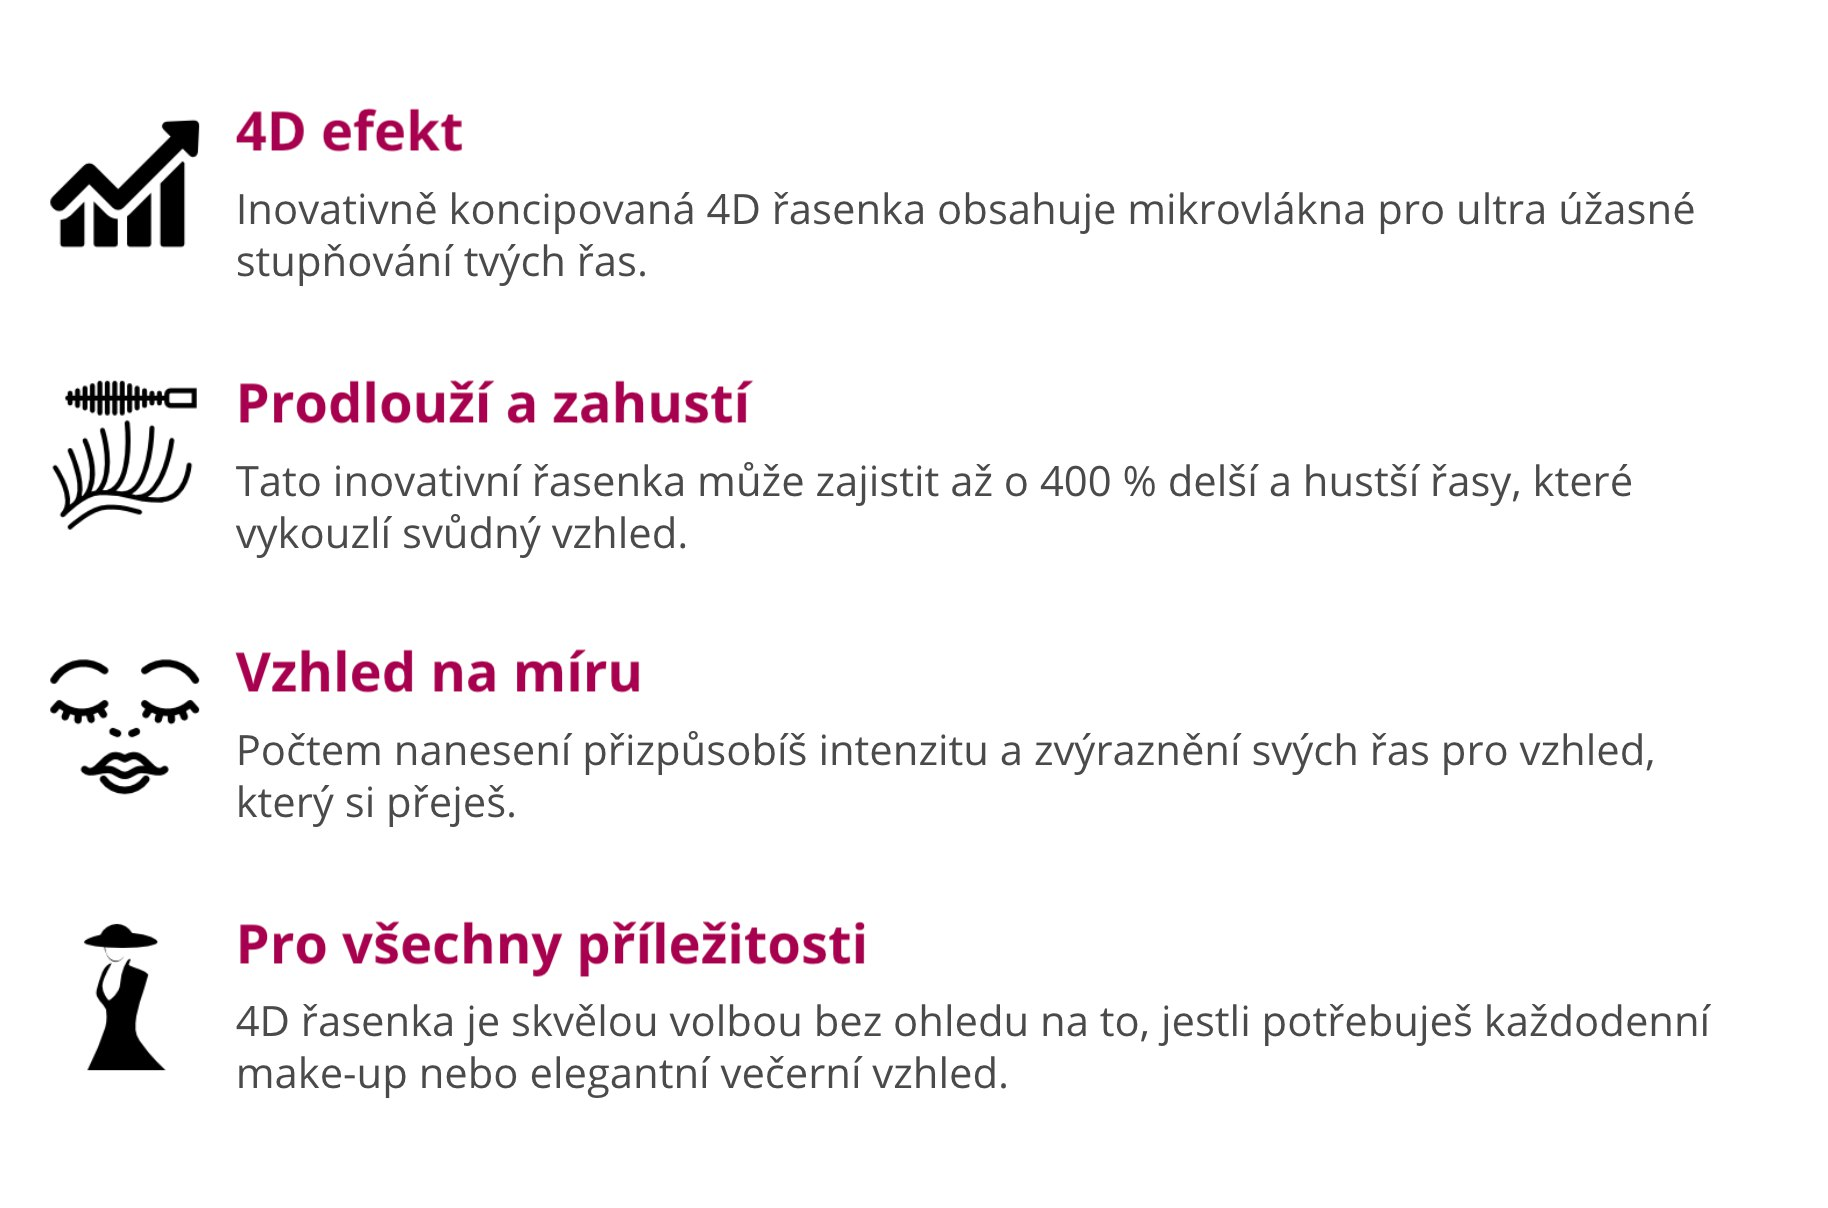 vibely-secret-rasenka-ultra-4d-efekt_5fec938b53c77